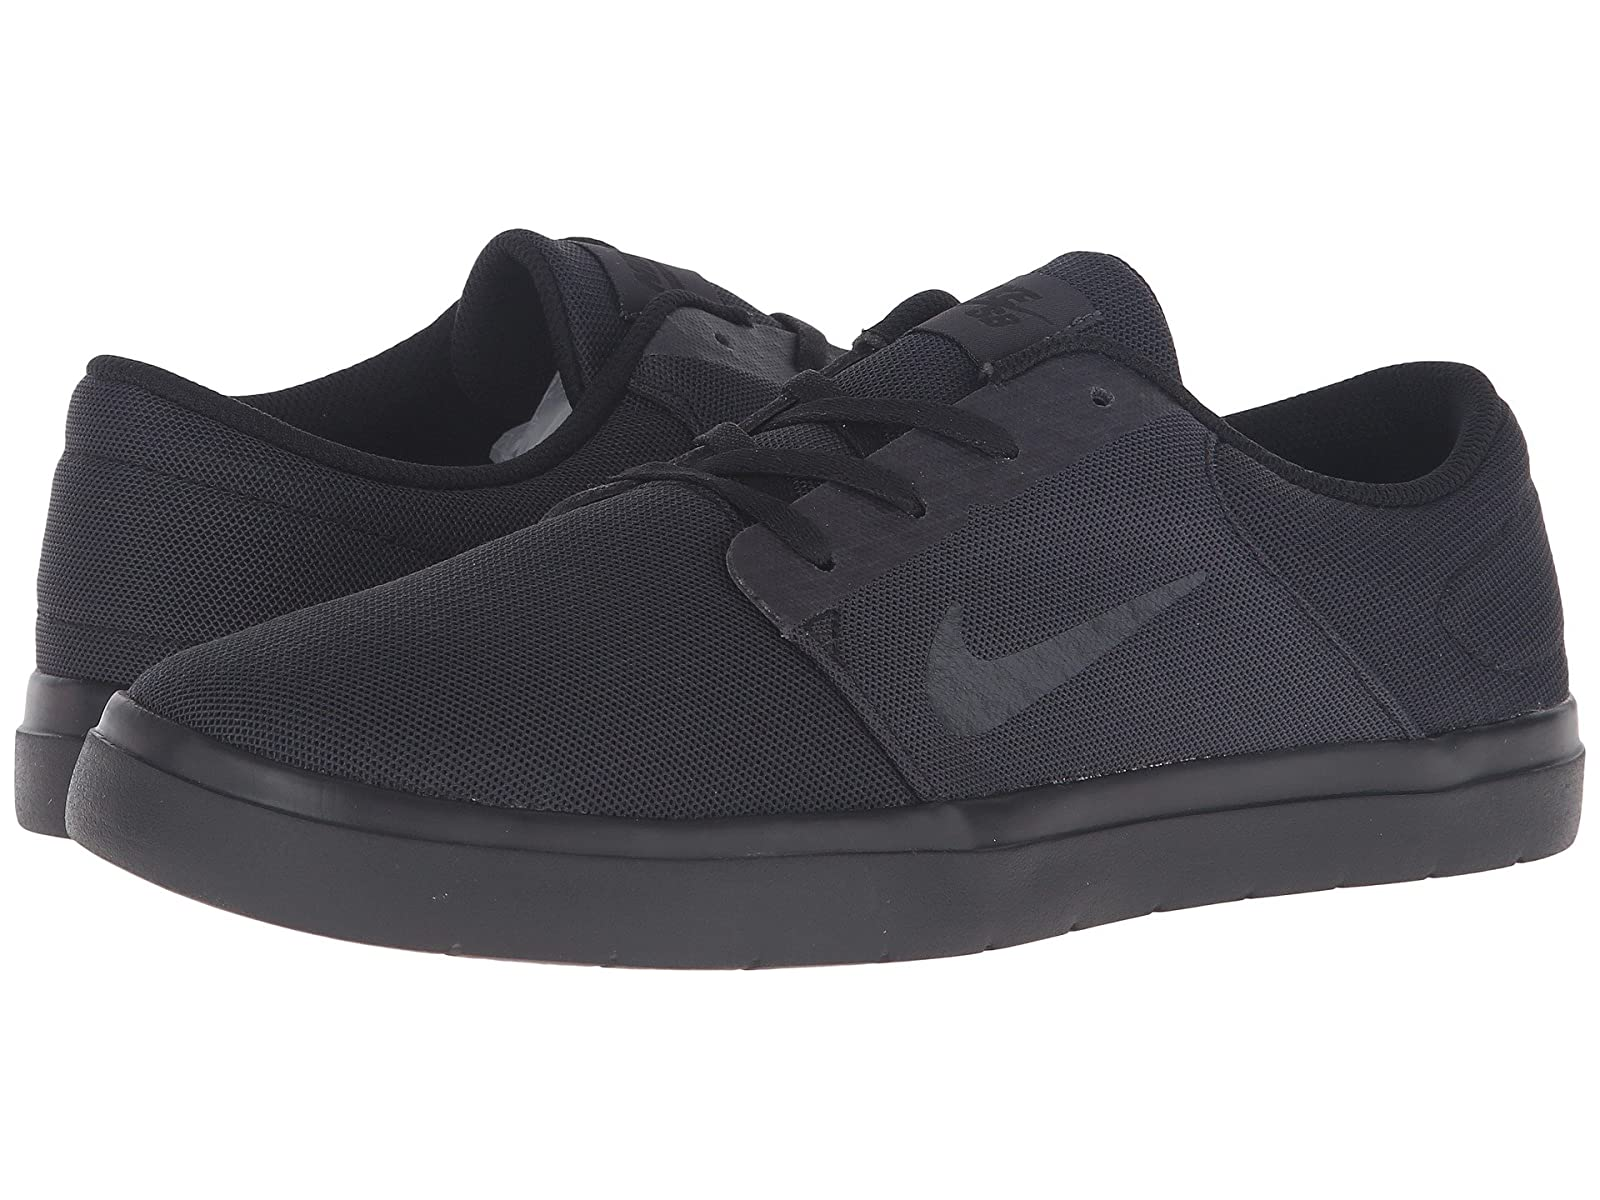 Nike SB Portmore Ultralight MeshCheap and distinctive eye-catching shoes